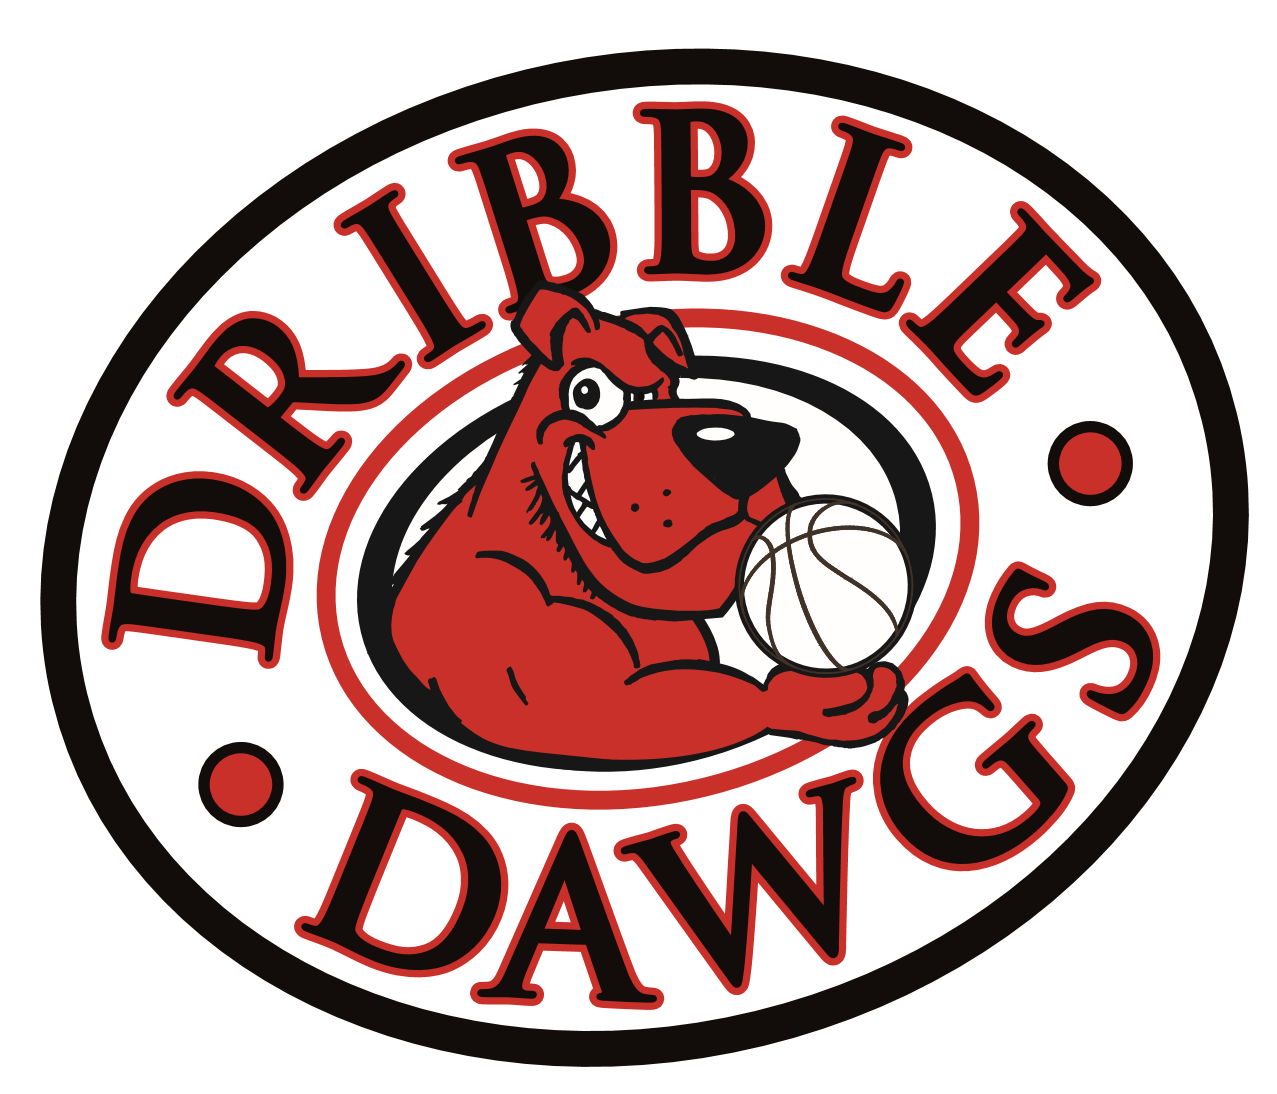 Dribble Dawgs - 2017-18 Basketball SeasonSign Up Below